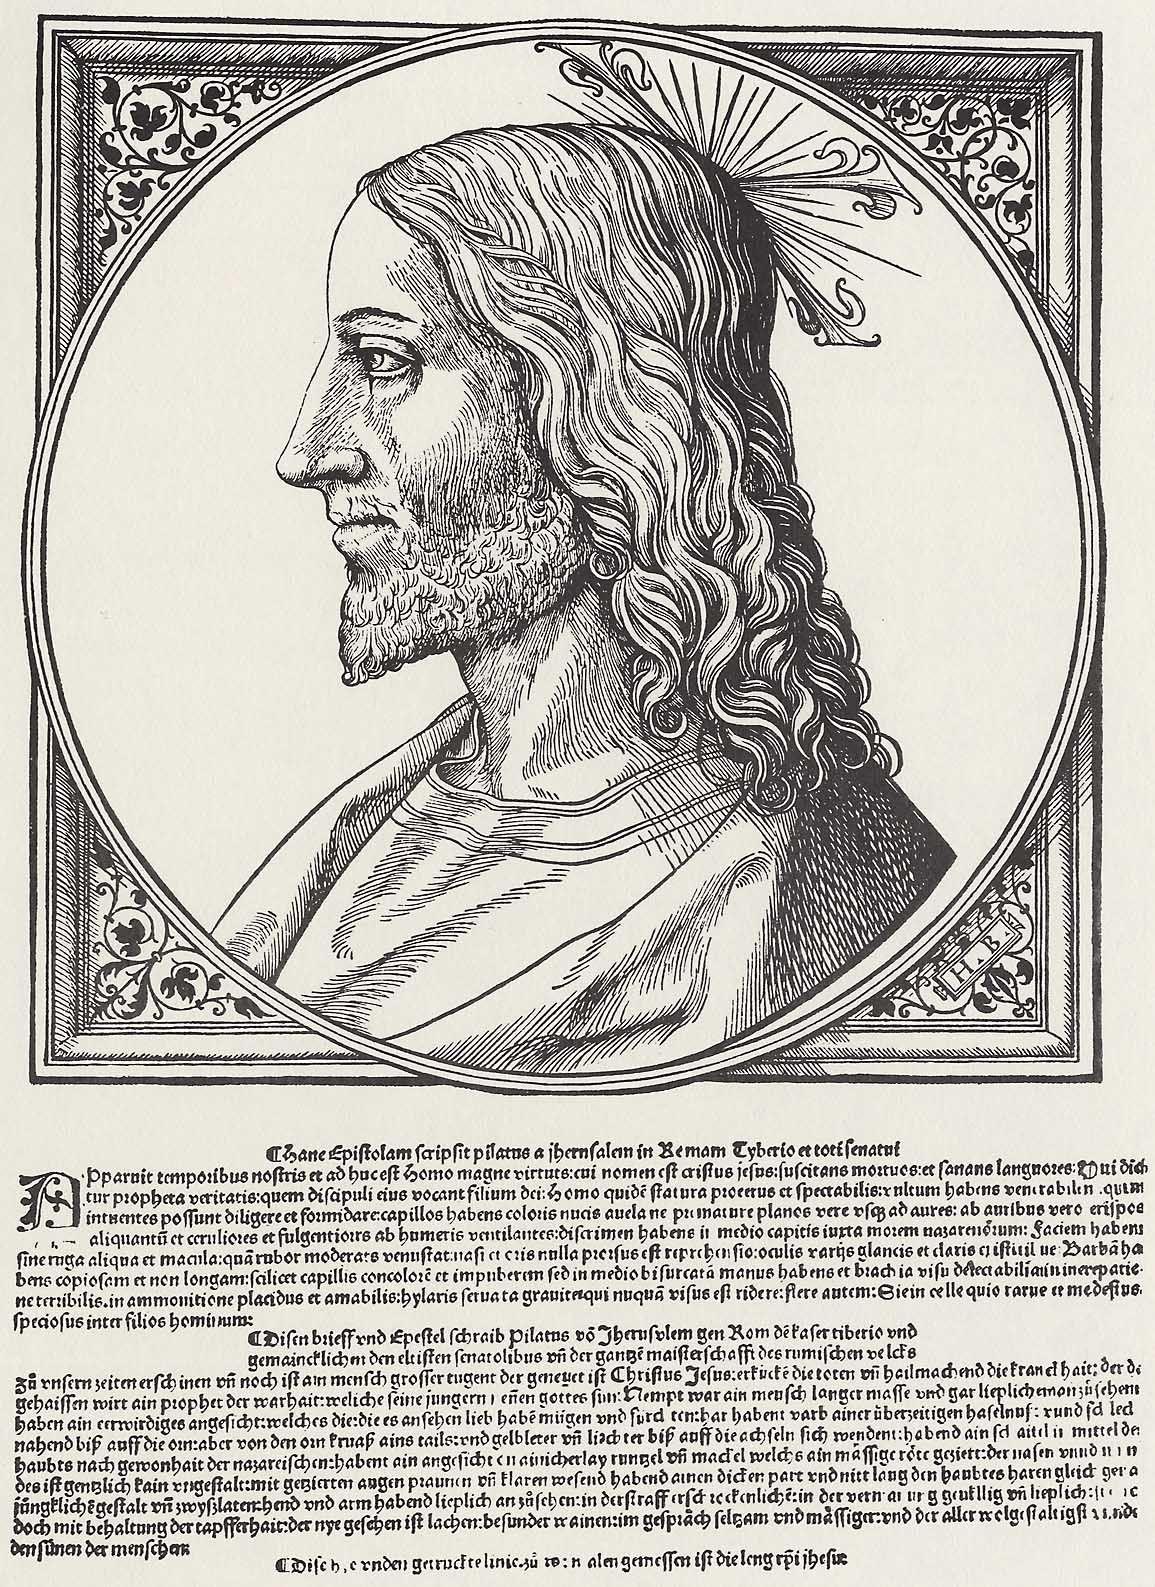 Burgkmair d. Ä., Hans: Antlitz Christi in einem Ornamentrahmen ...